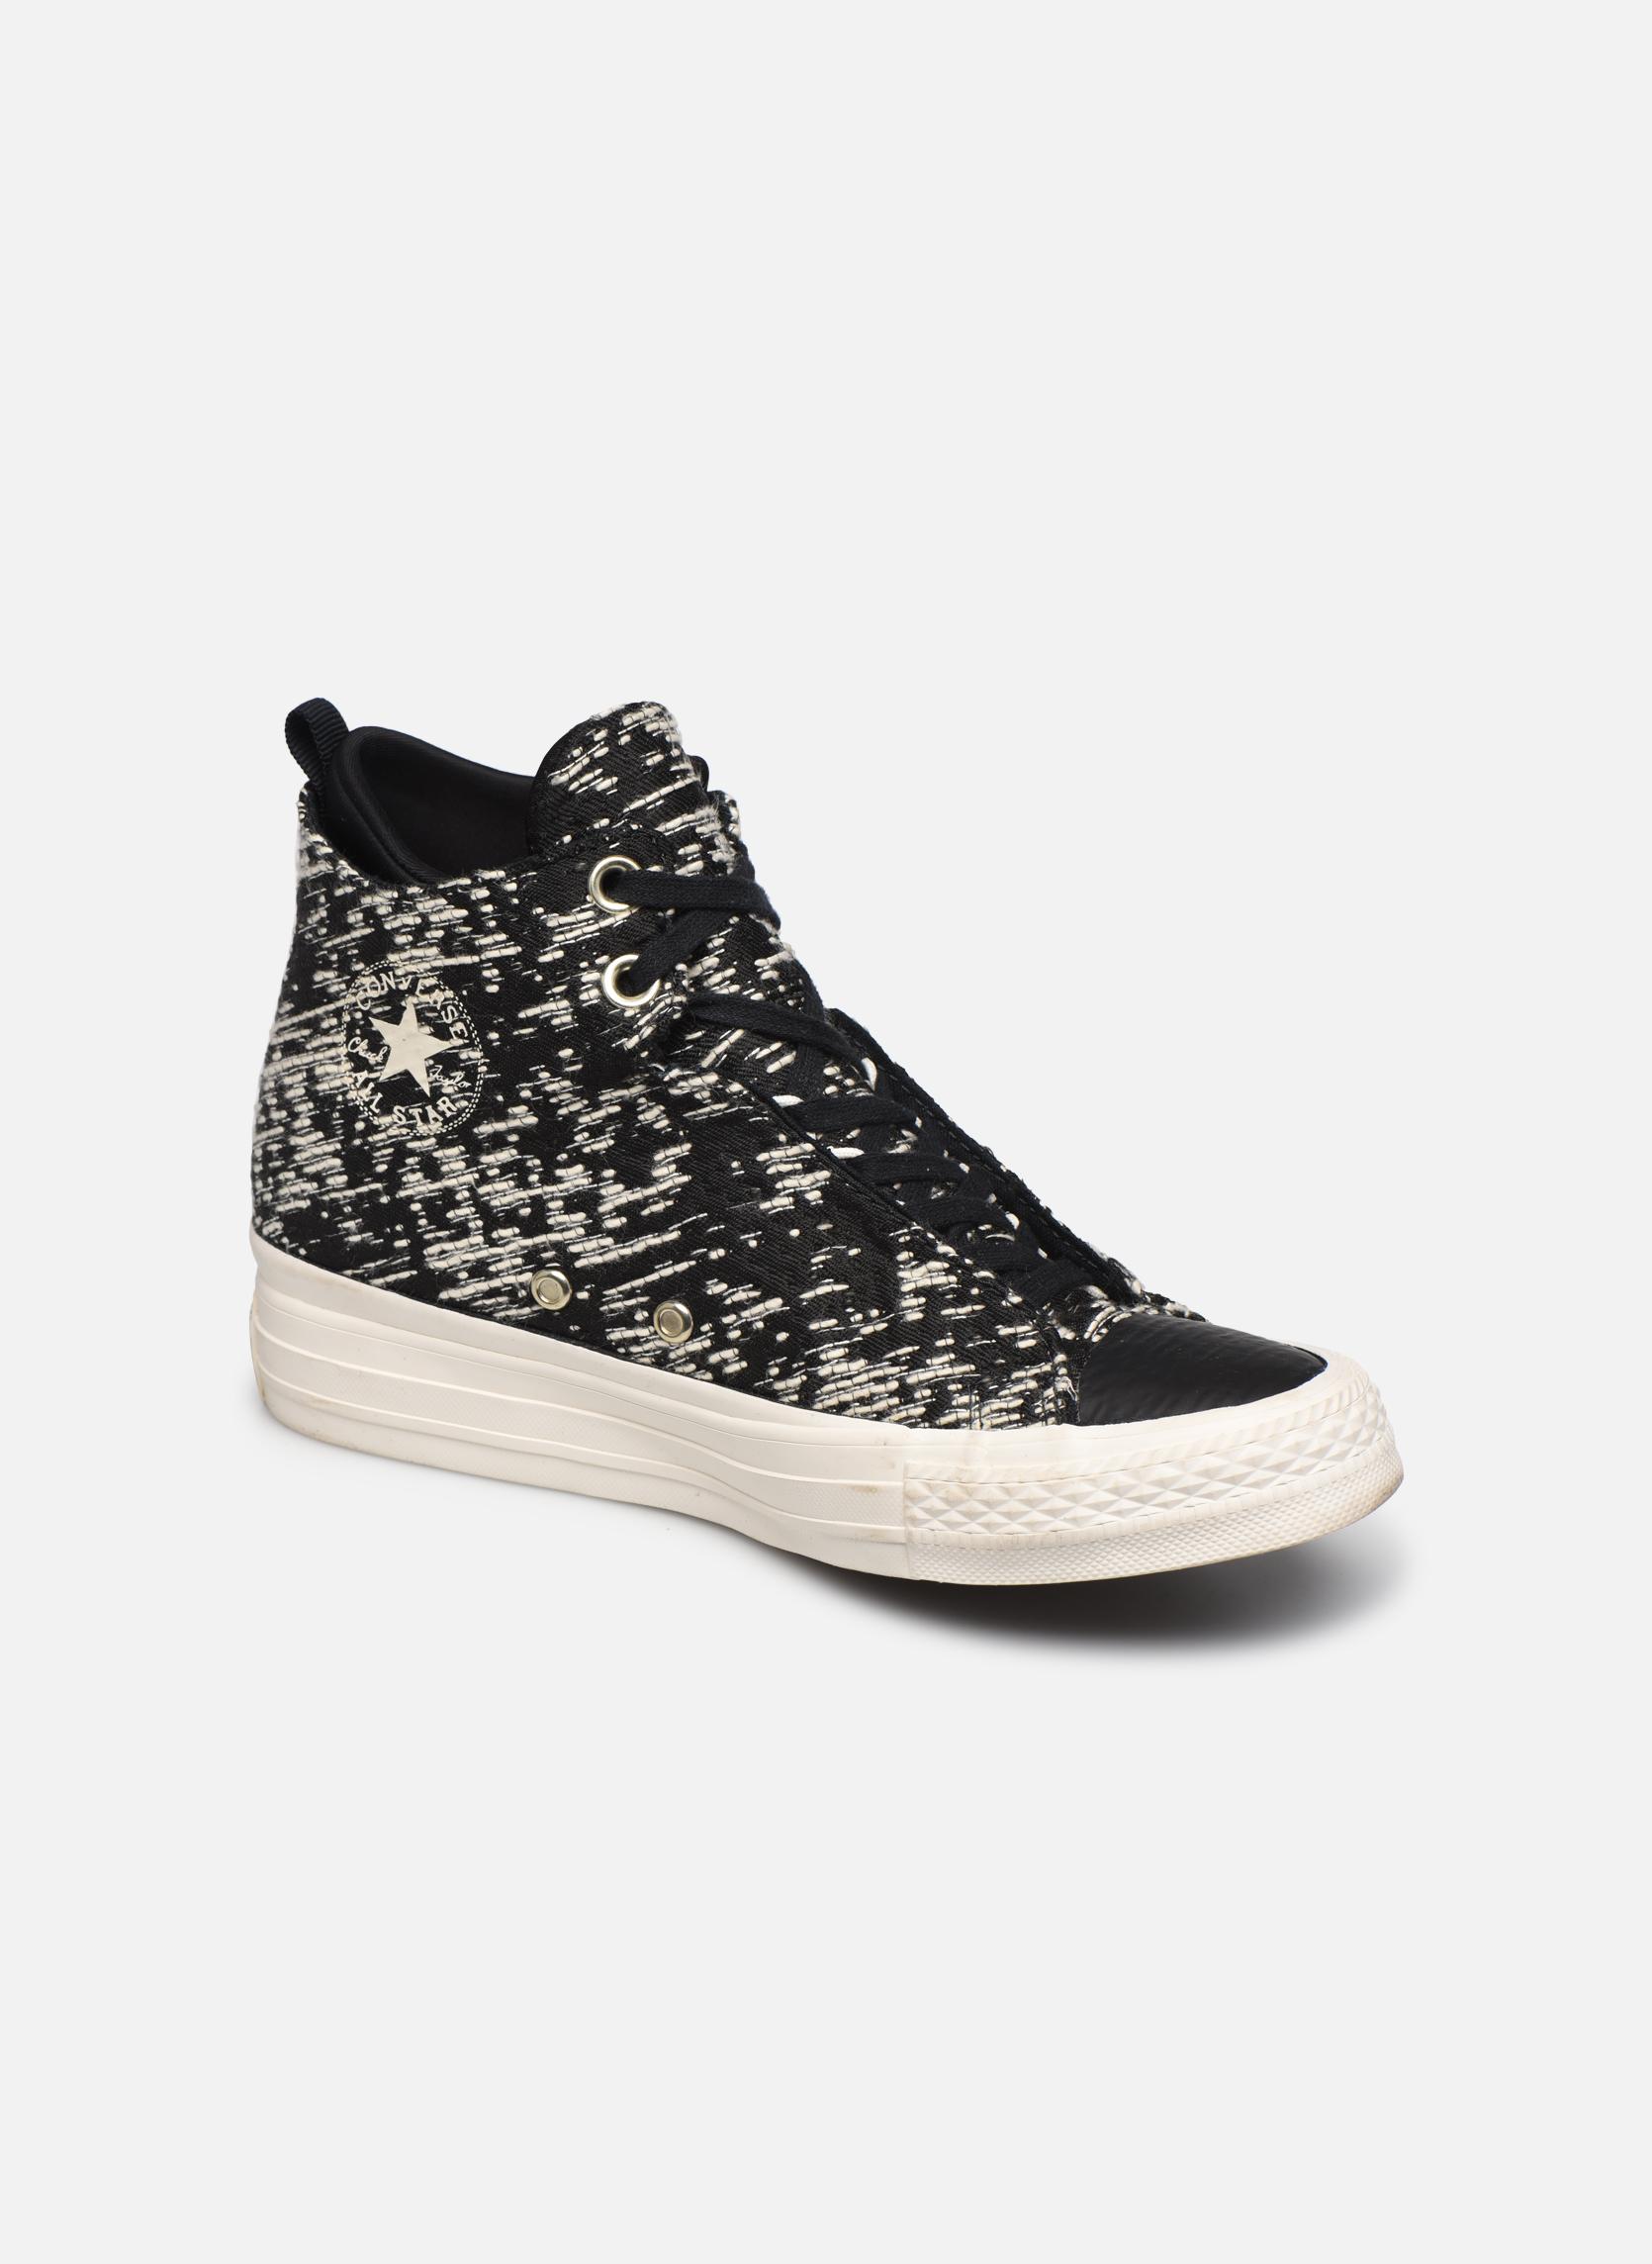 Ctas Selene Winter Knit Mid Black/gold